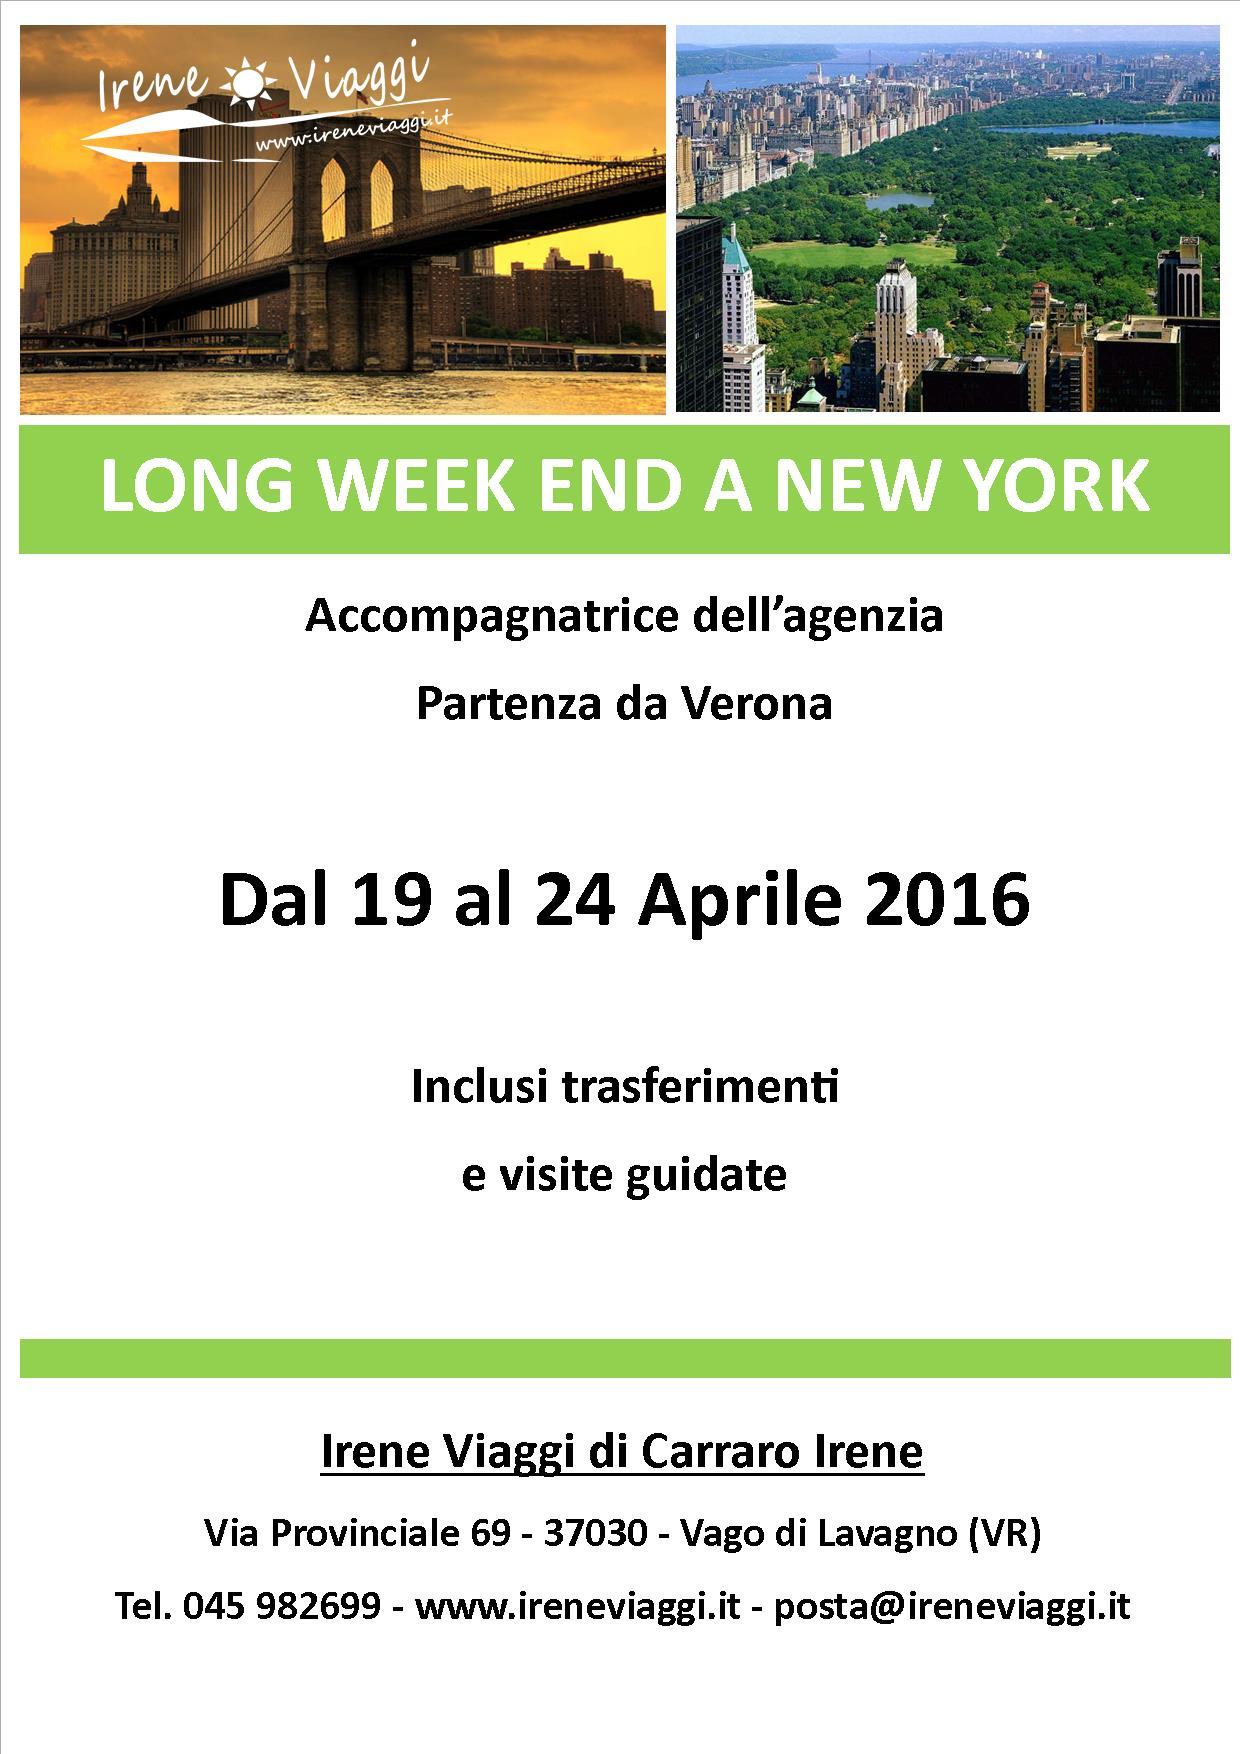 Long Week End a New York